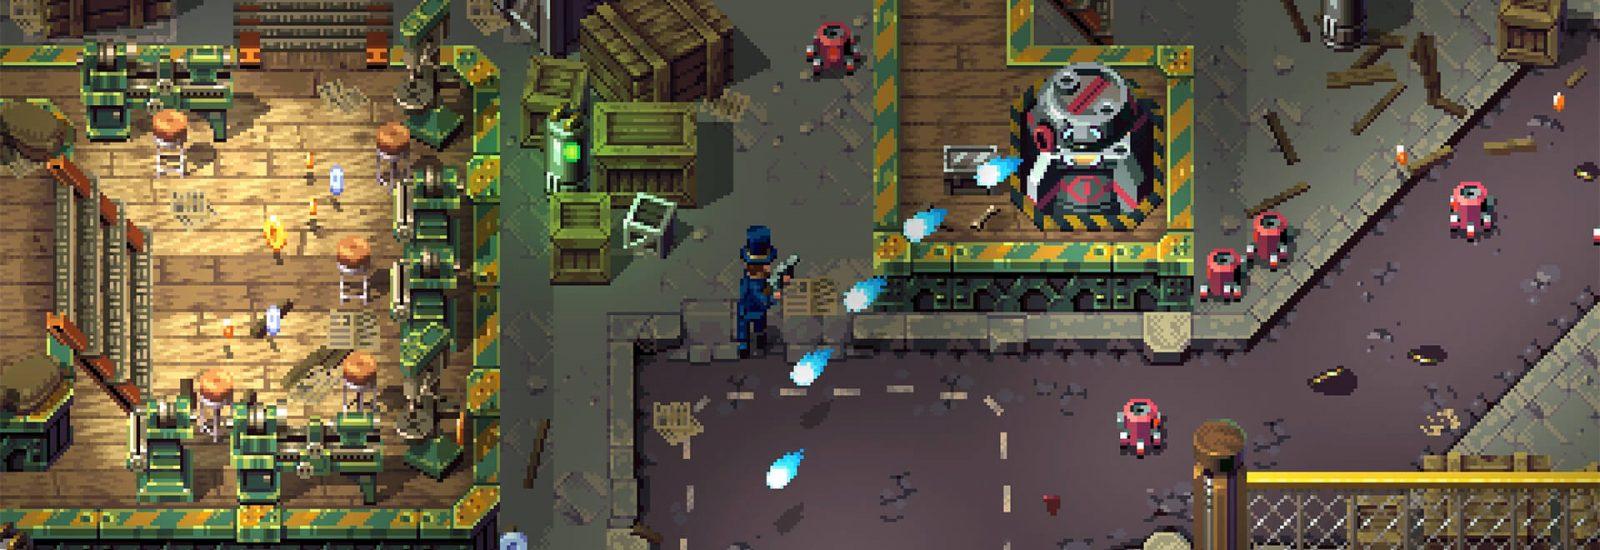 Tower 57 - Editează - Digital Games